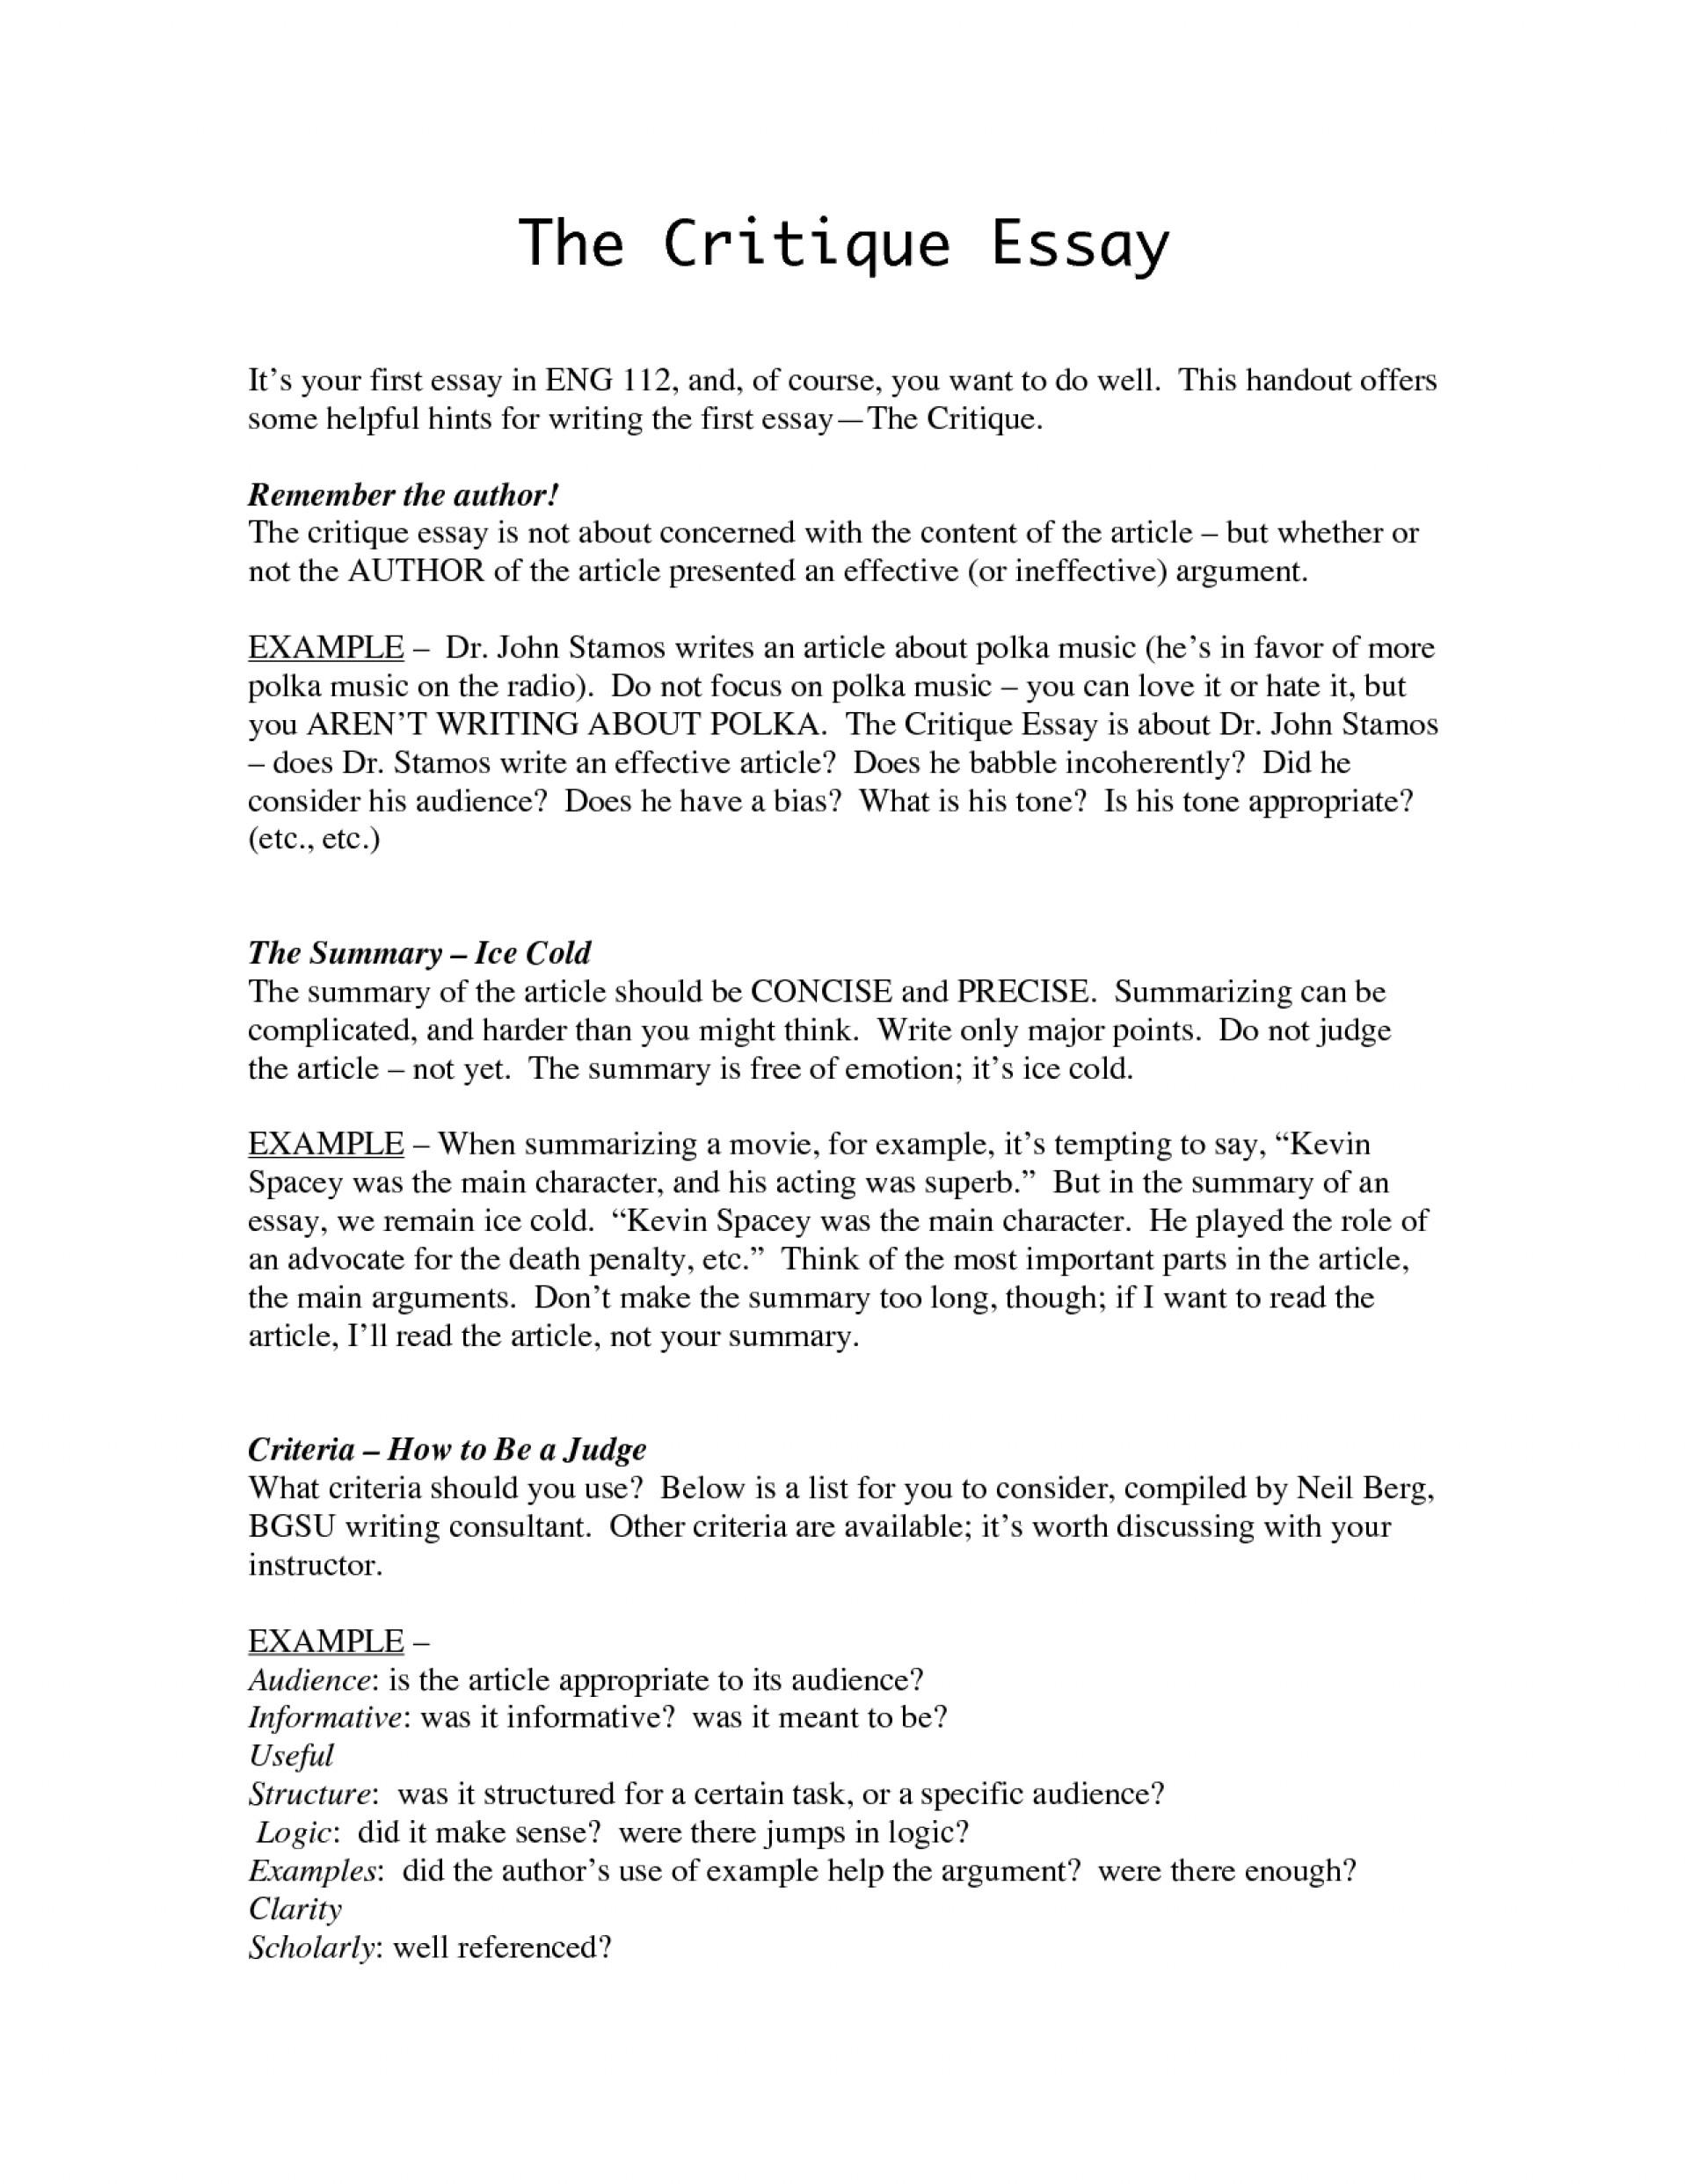 critical evaluation essay example writingassessmentsandrubrics    essay example evaluation best photos film critique art movie  definition critical formidable i have a